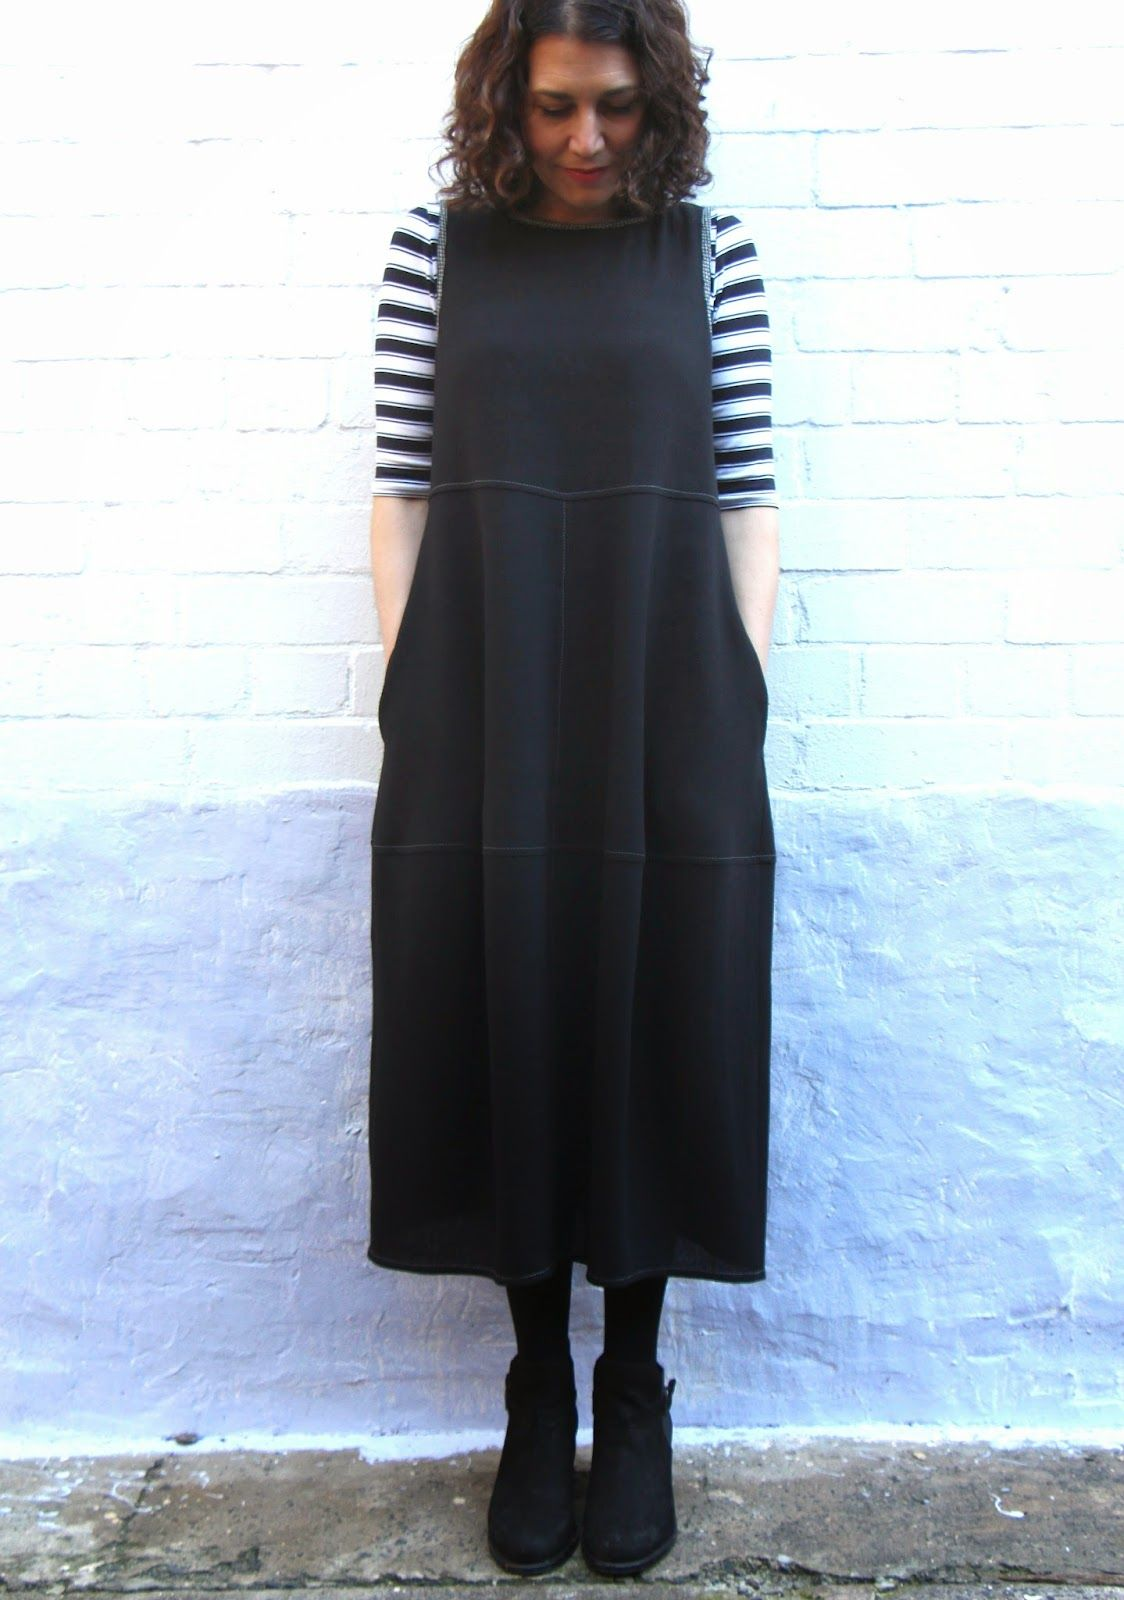 840d0622bc Winter Eva Tunic Dress in Nero Kurepu (Sew Tessuti) | Sewing ...